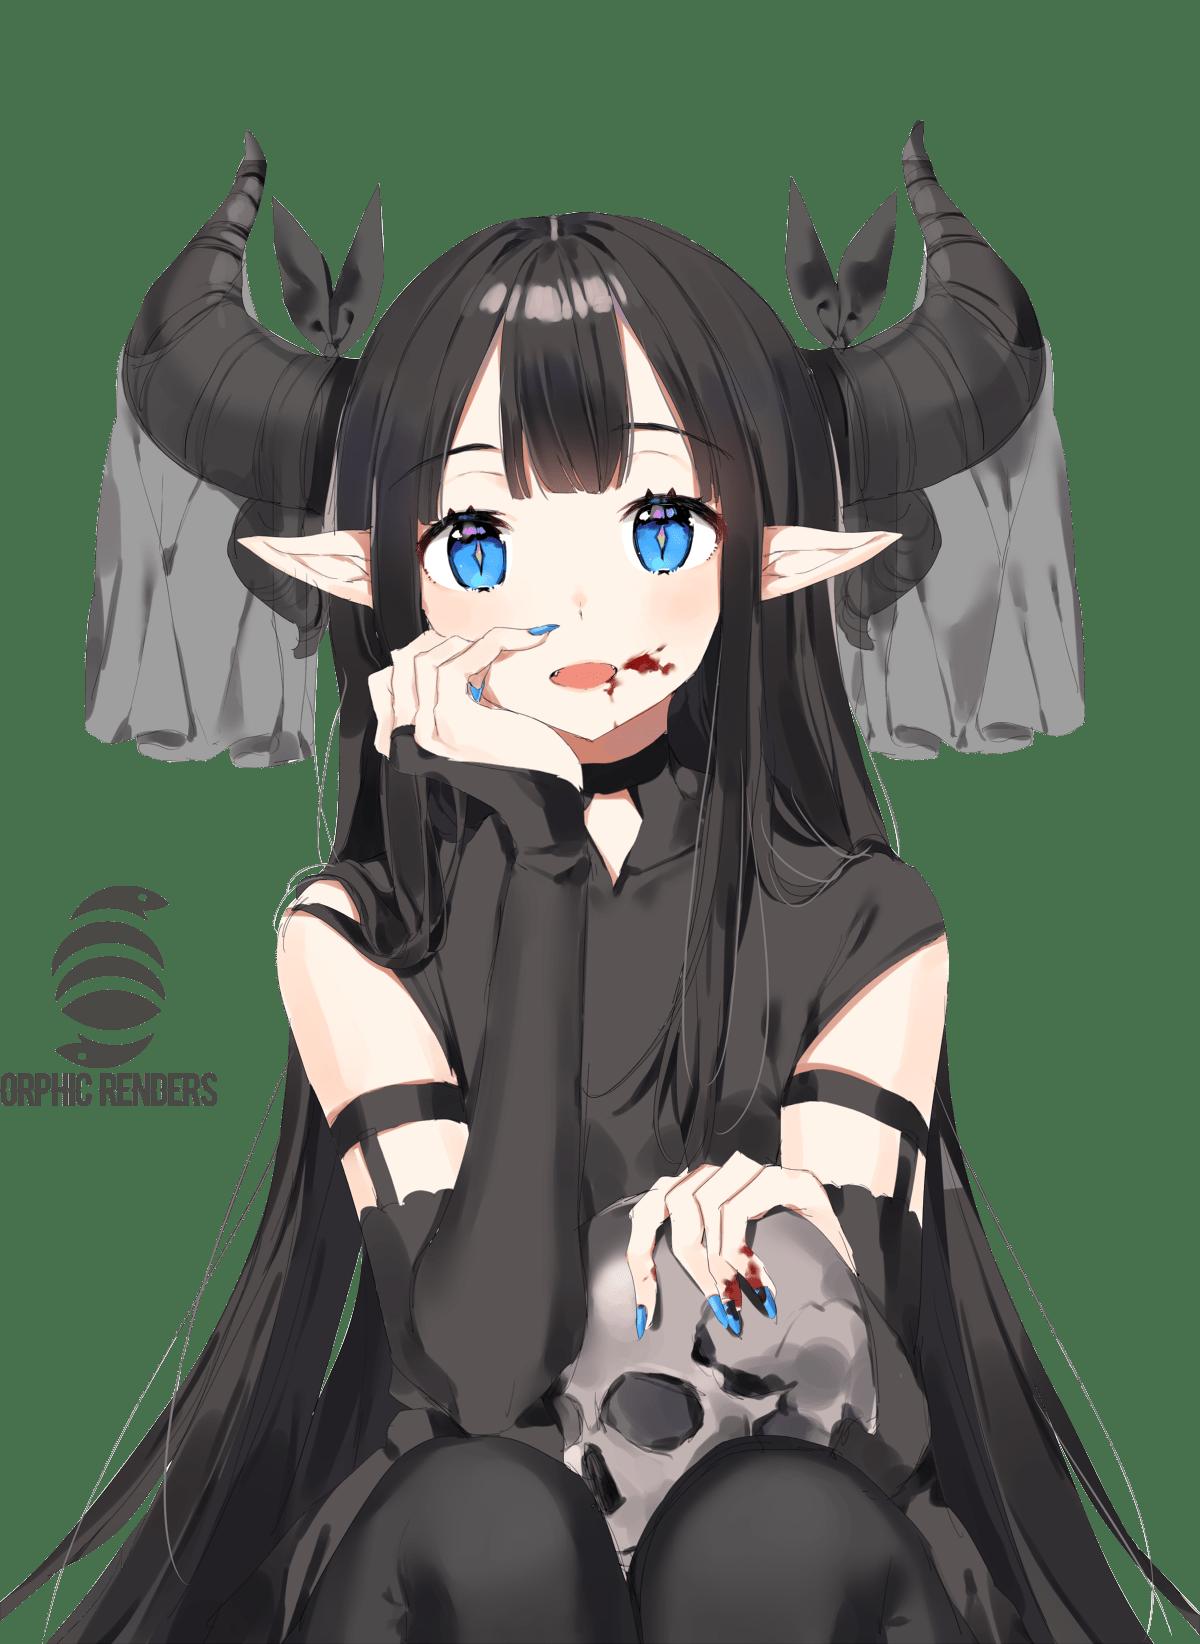 Cute Anime Boy Full Hd Wallpaper Wallpaper Original Characters Anime Girls Demon Elf